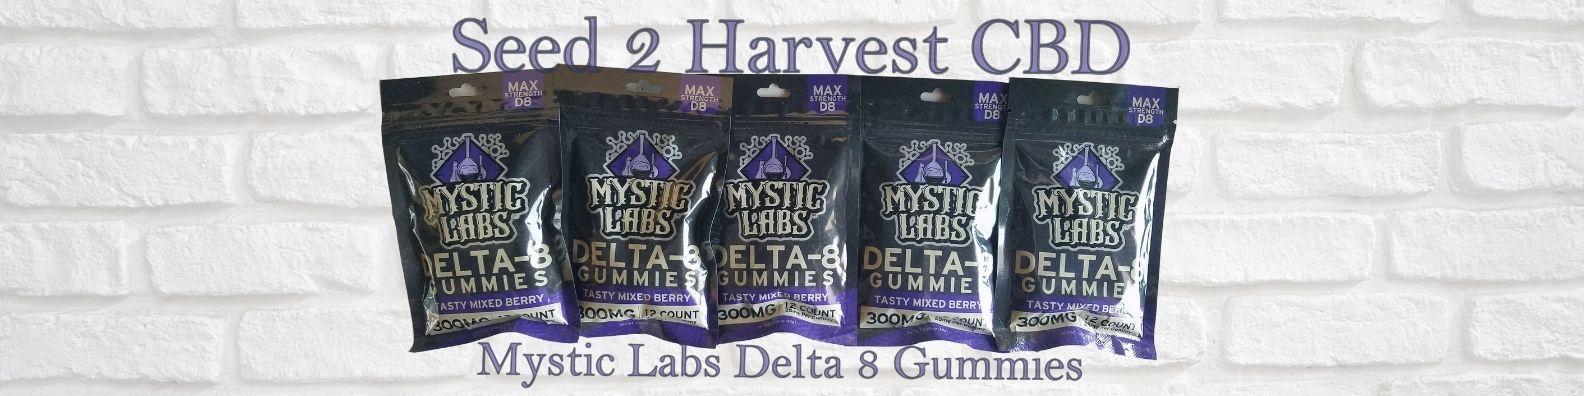 mystic labs delta 8 thc gummies 12 count 300mg